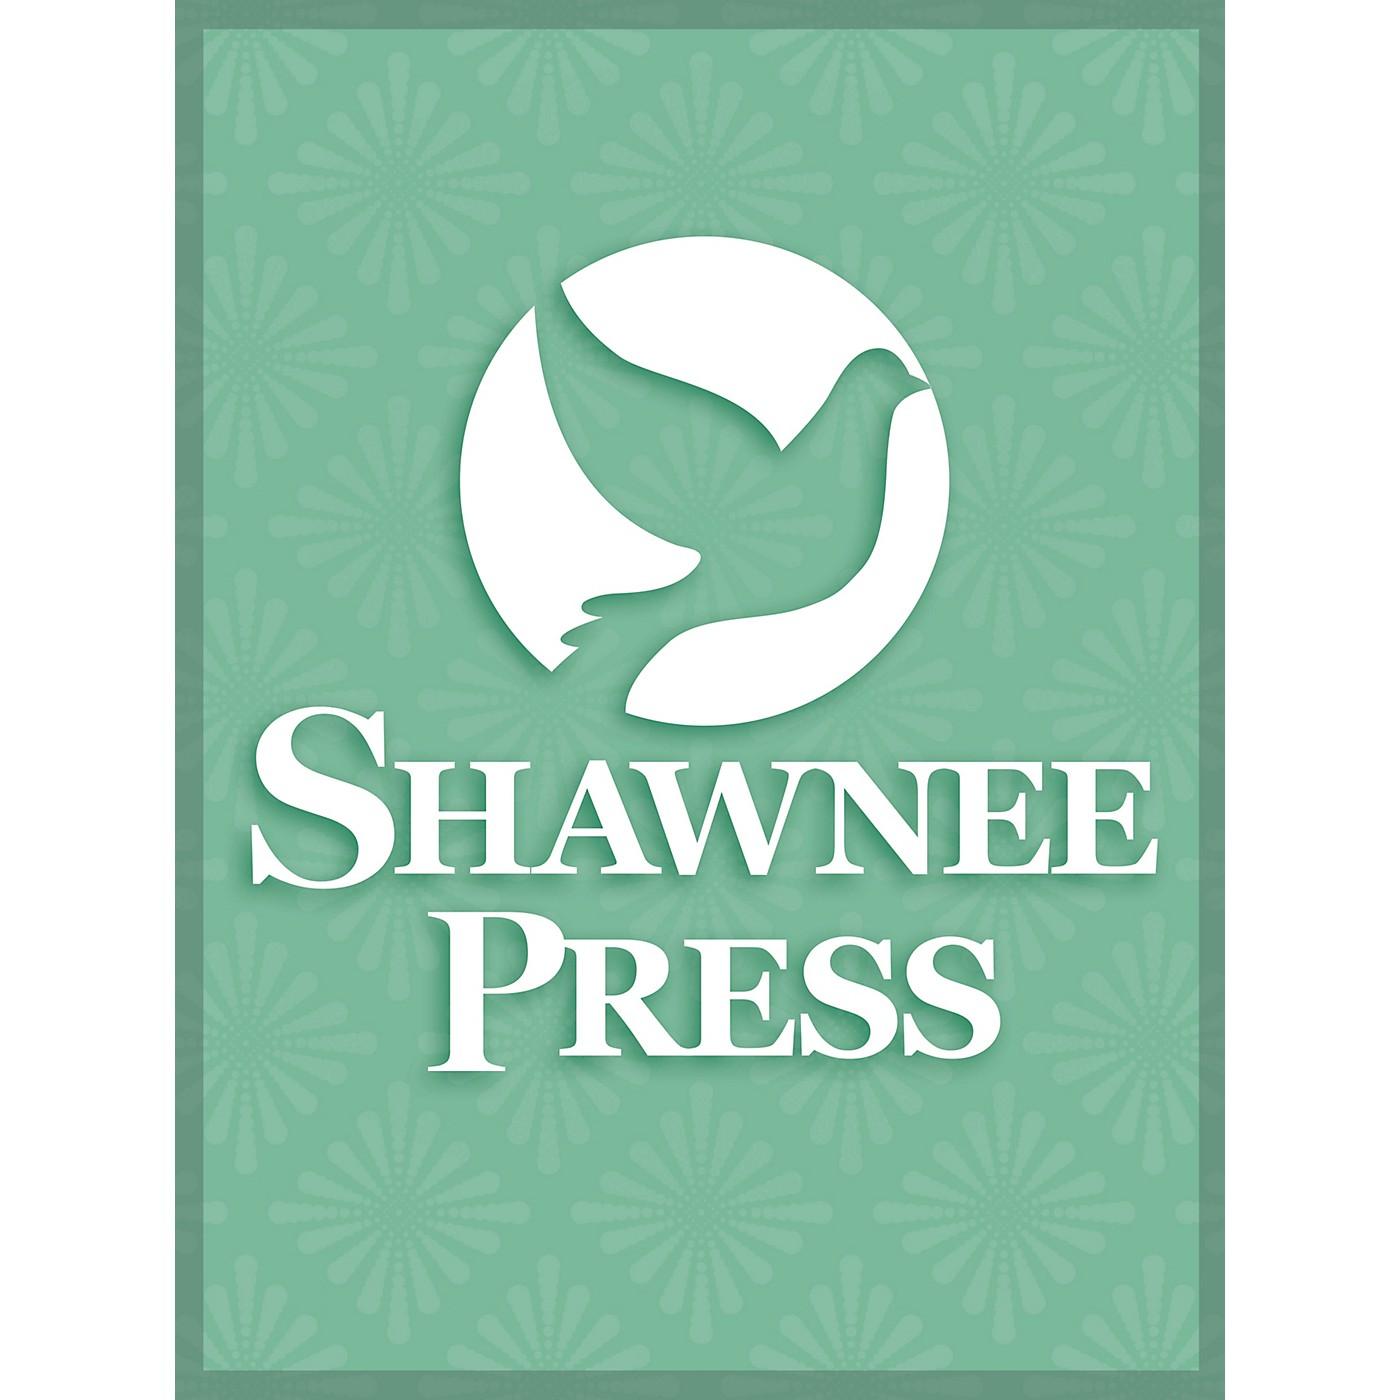 Shawnee Press Olympic Fanfare (3-5 Octaves of Handbells) Handbell Acc Arranged by R. Currier thumbnail